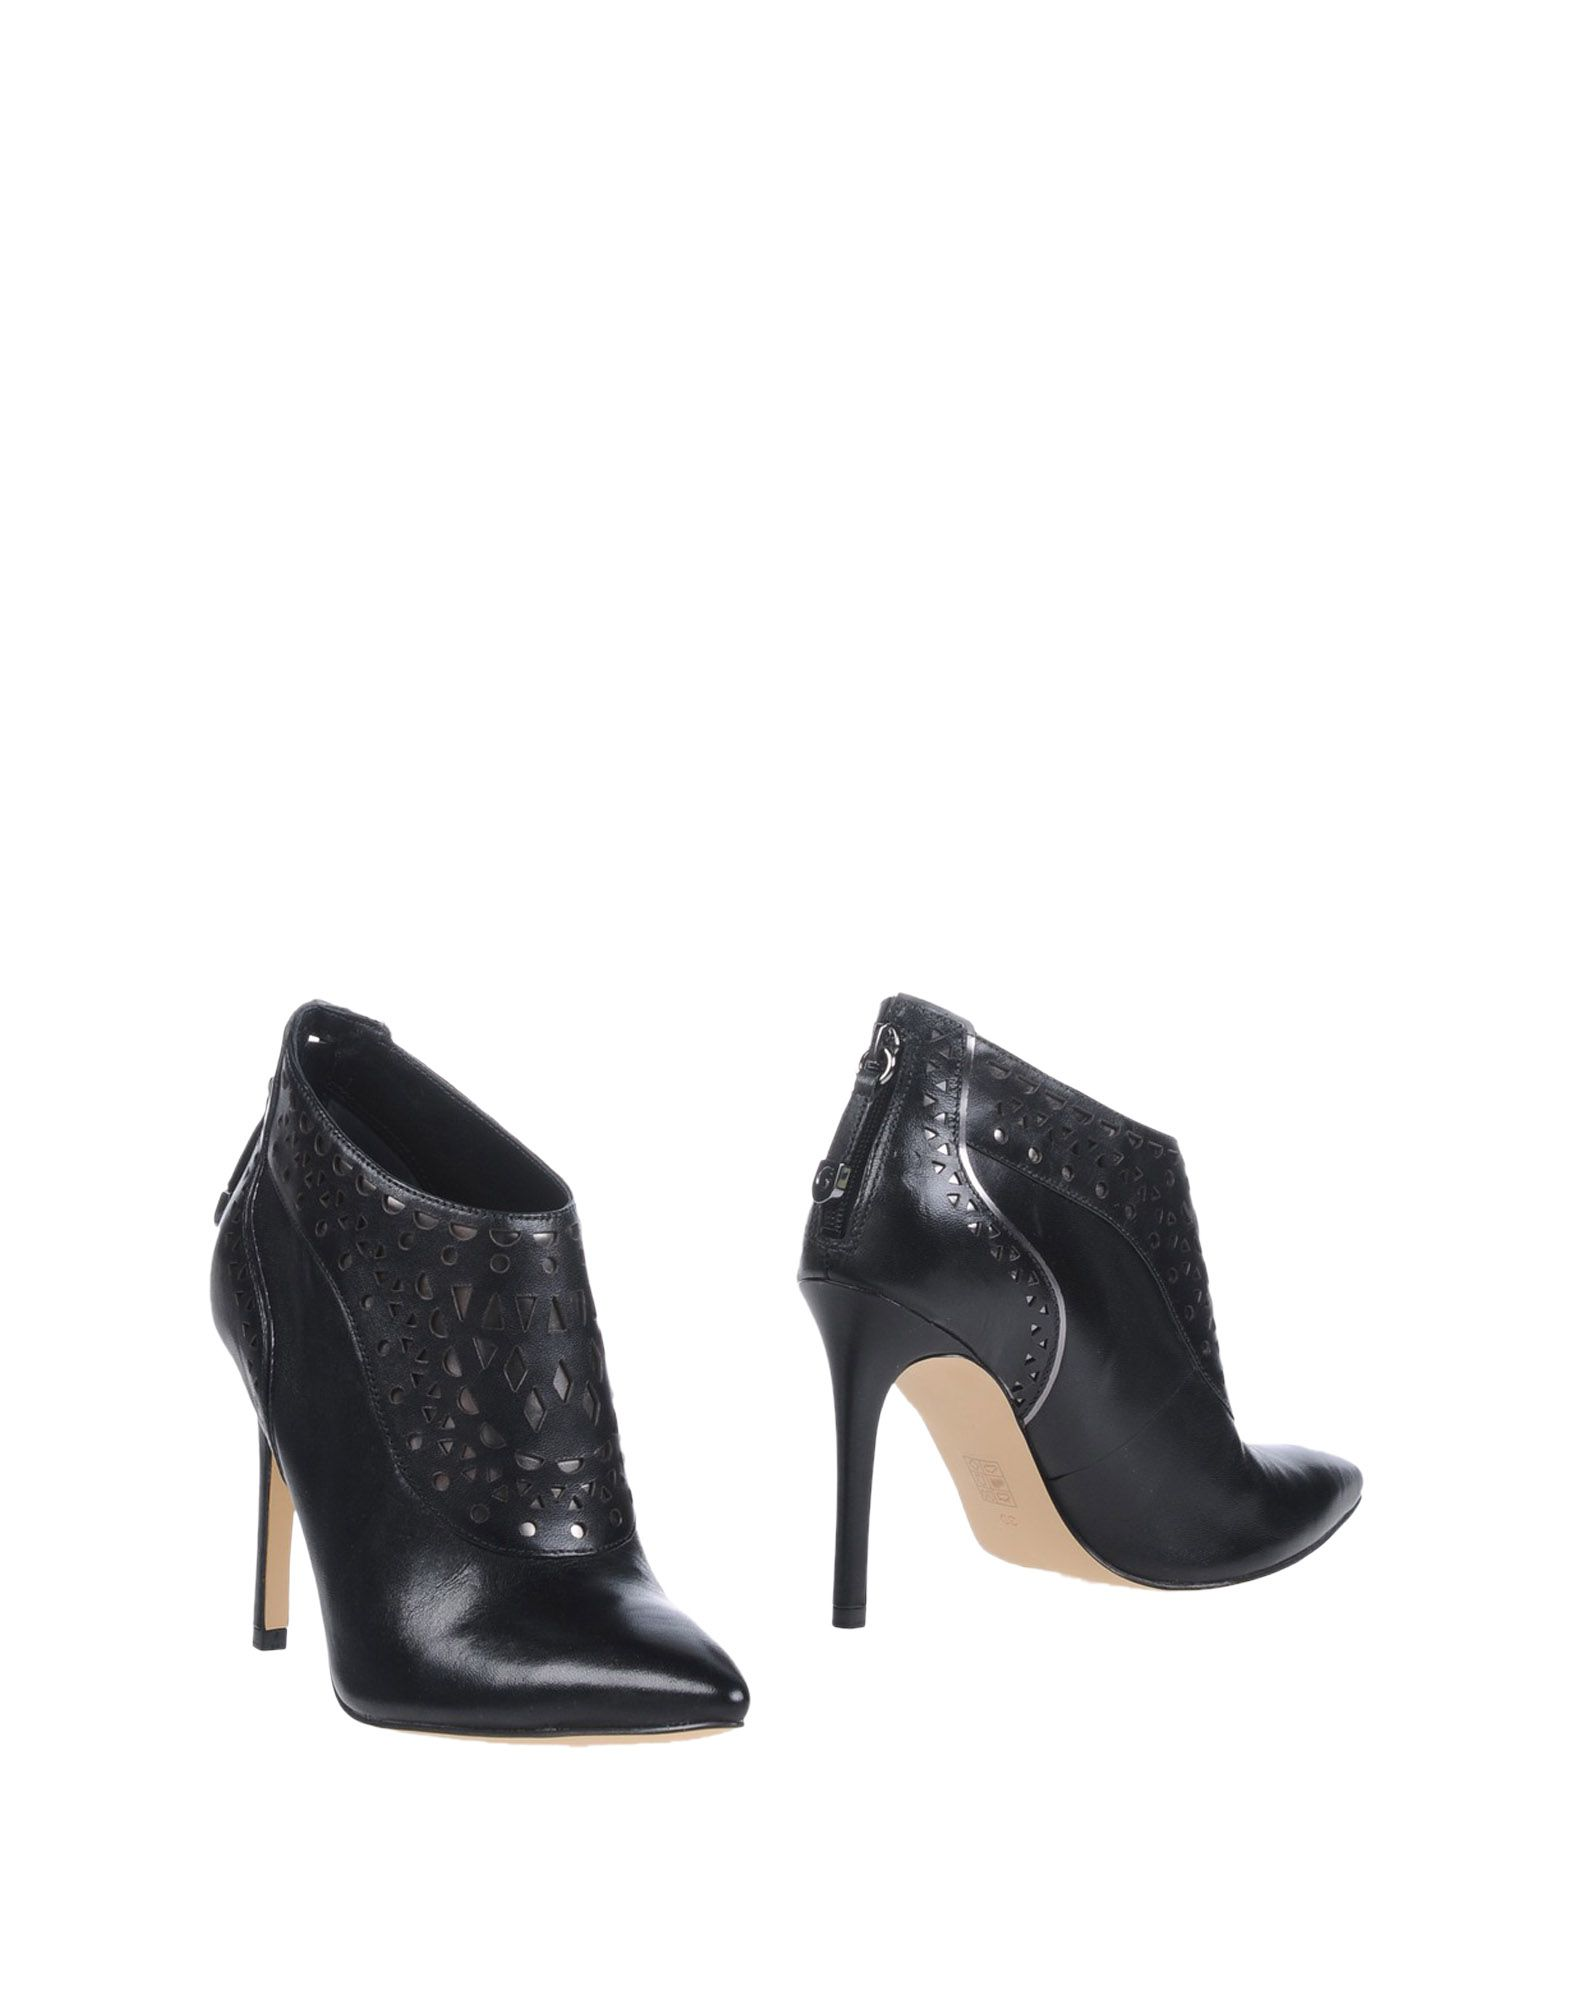 Guess Ankle Boot - Women Guess Guess Guess Ankle Boots online on  United Kingdom - 11202861EV 7c8775